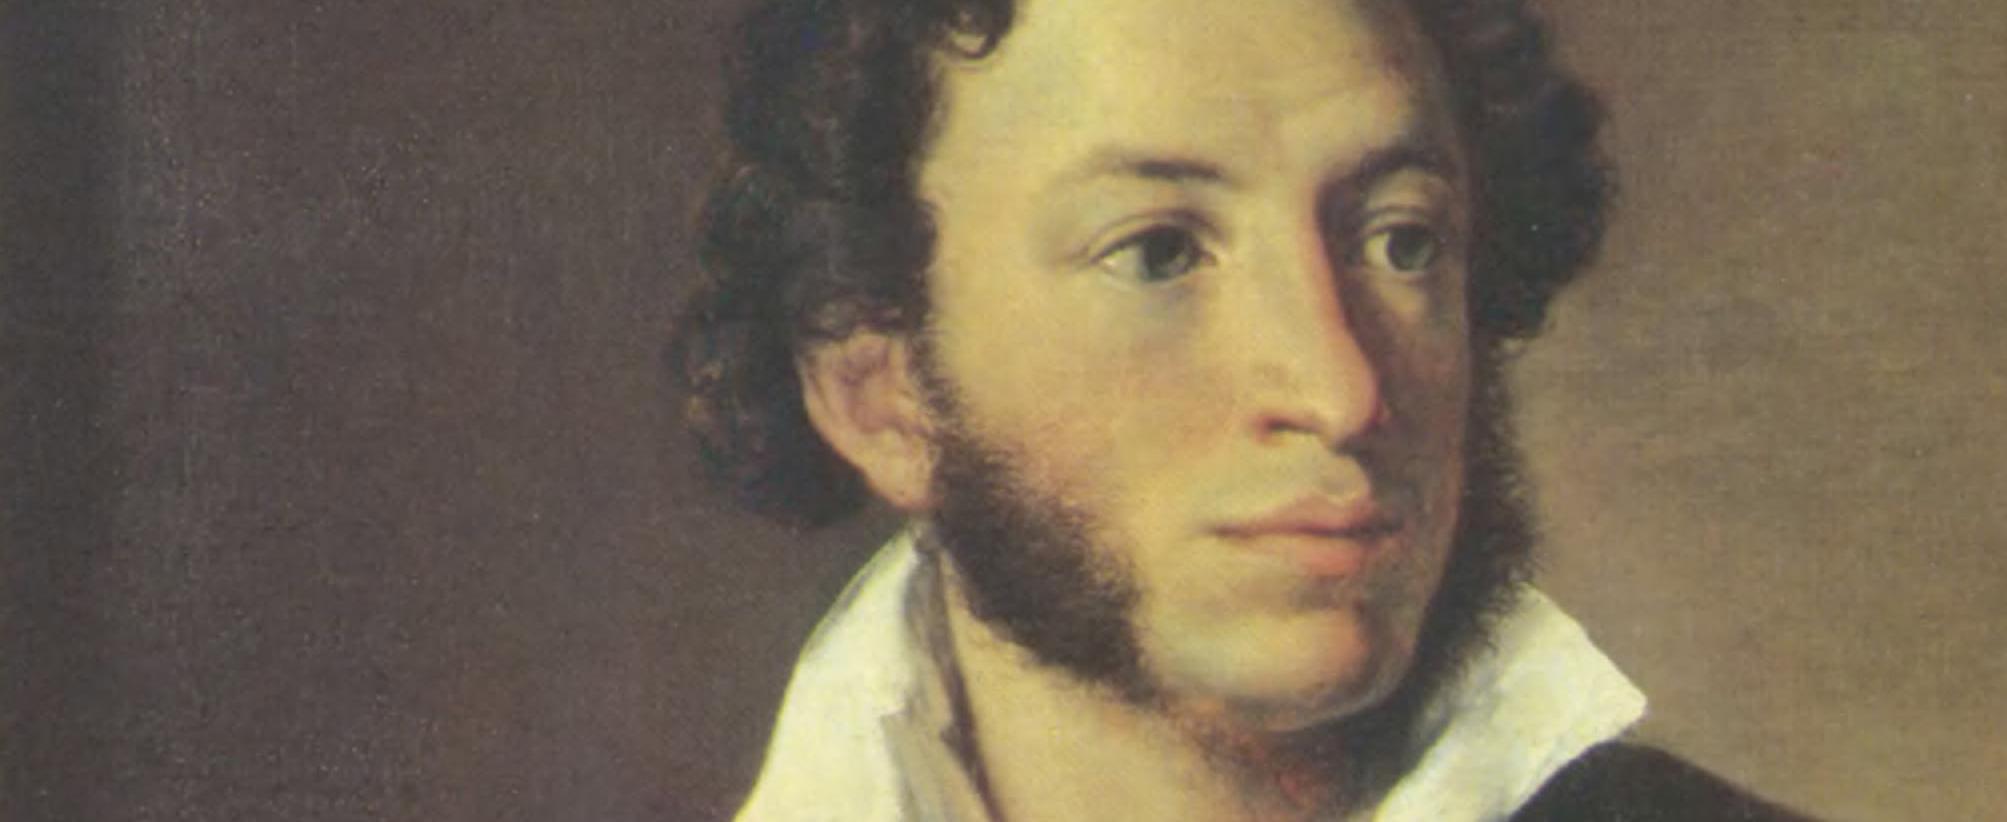 Генеалогический поиск Пушкина